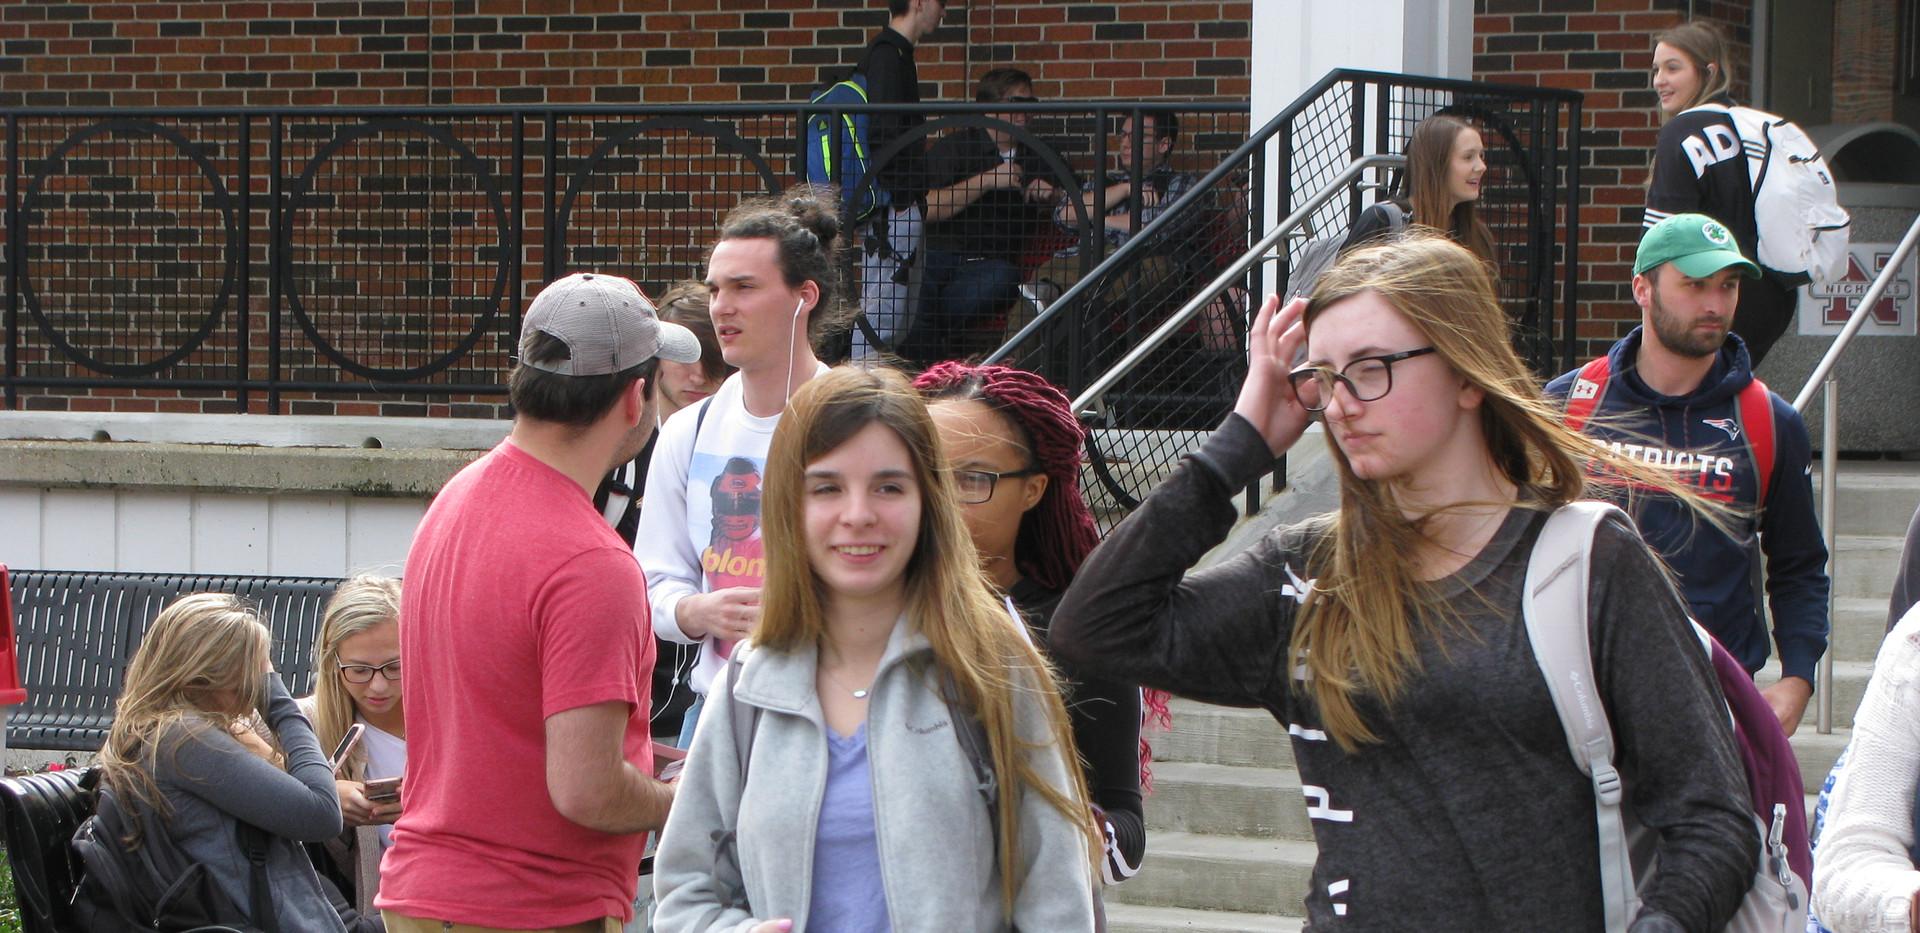 30. Thomas evangelizing the students at